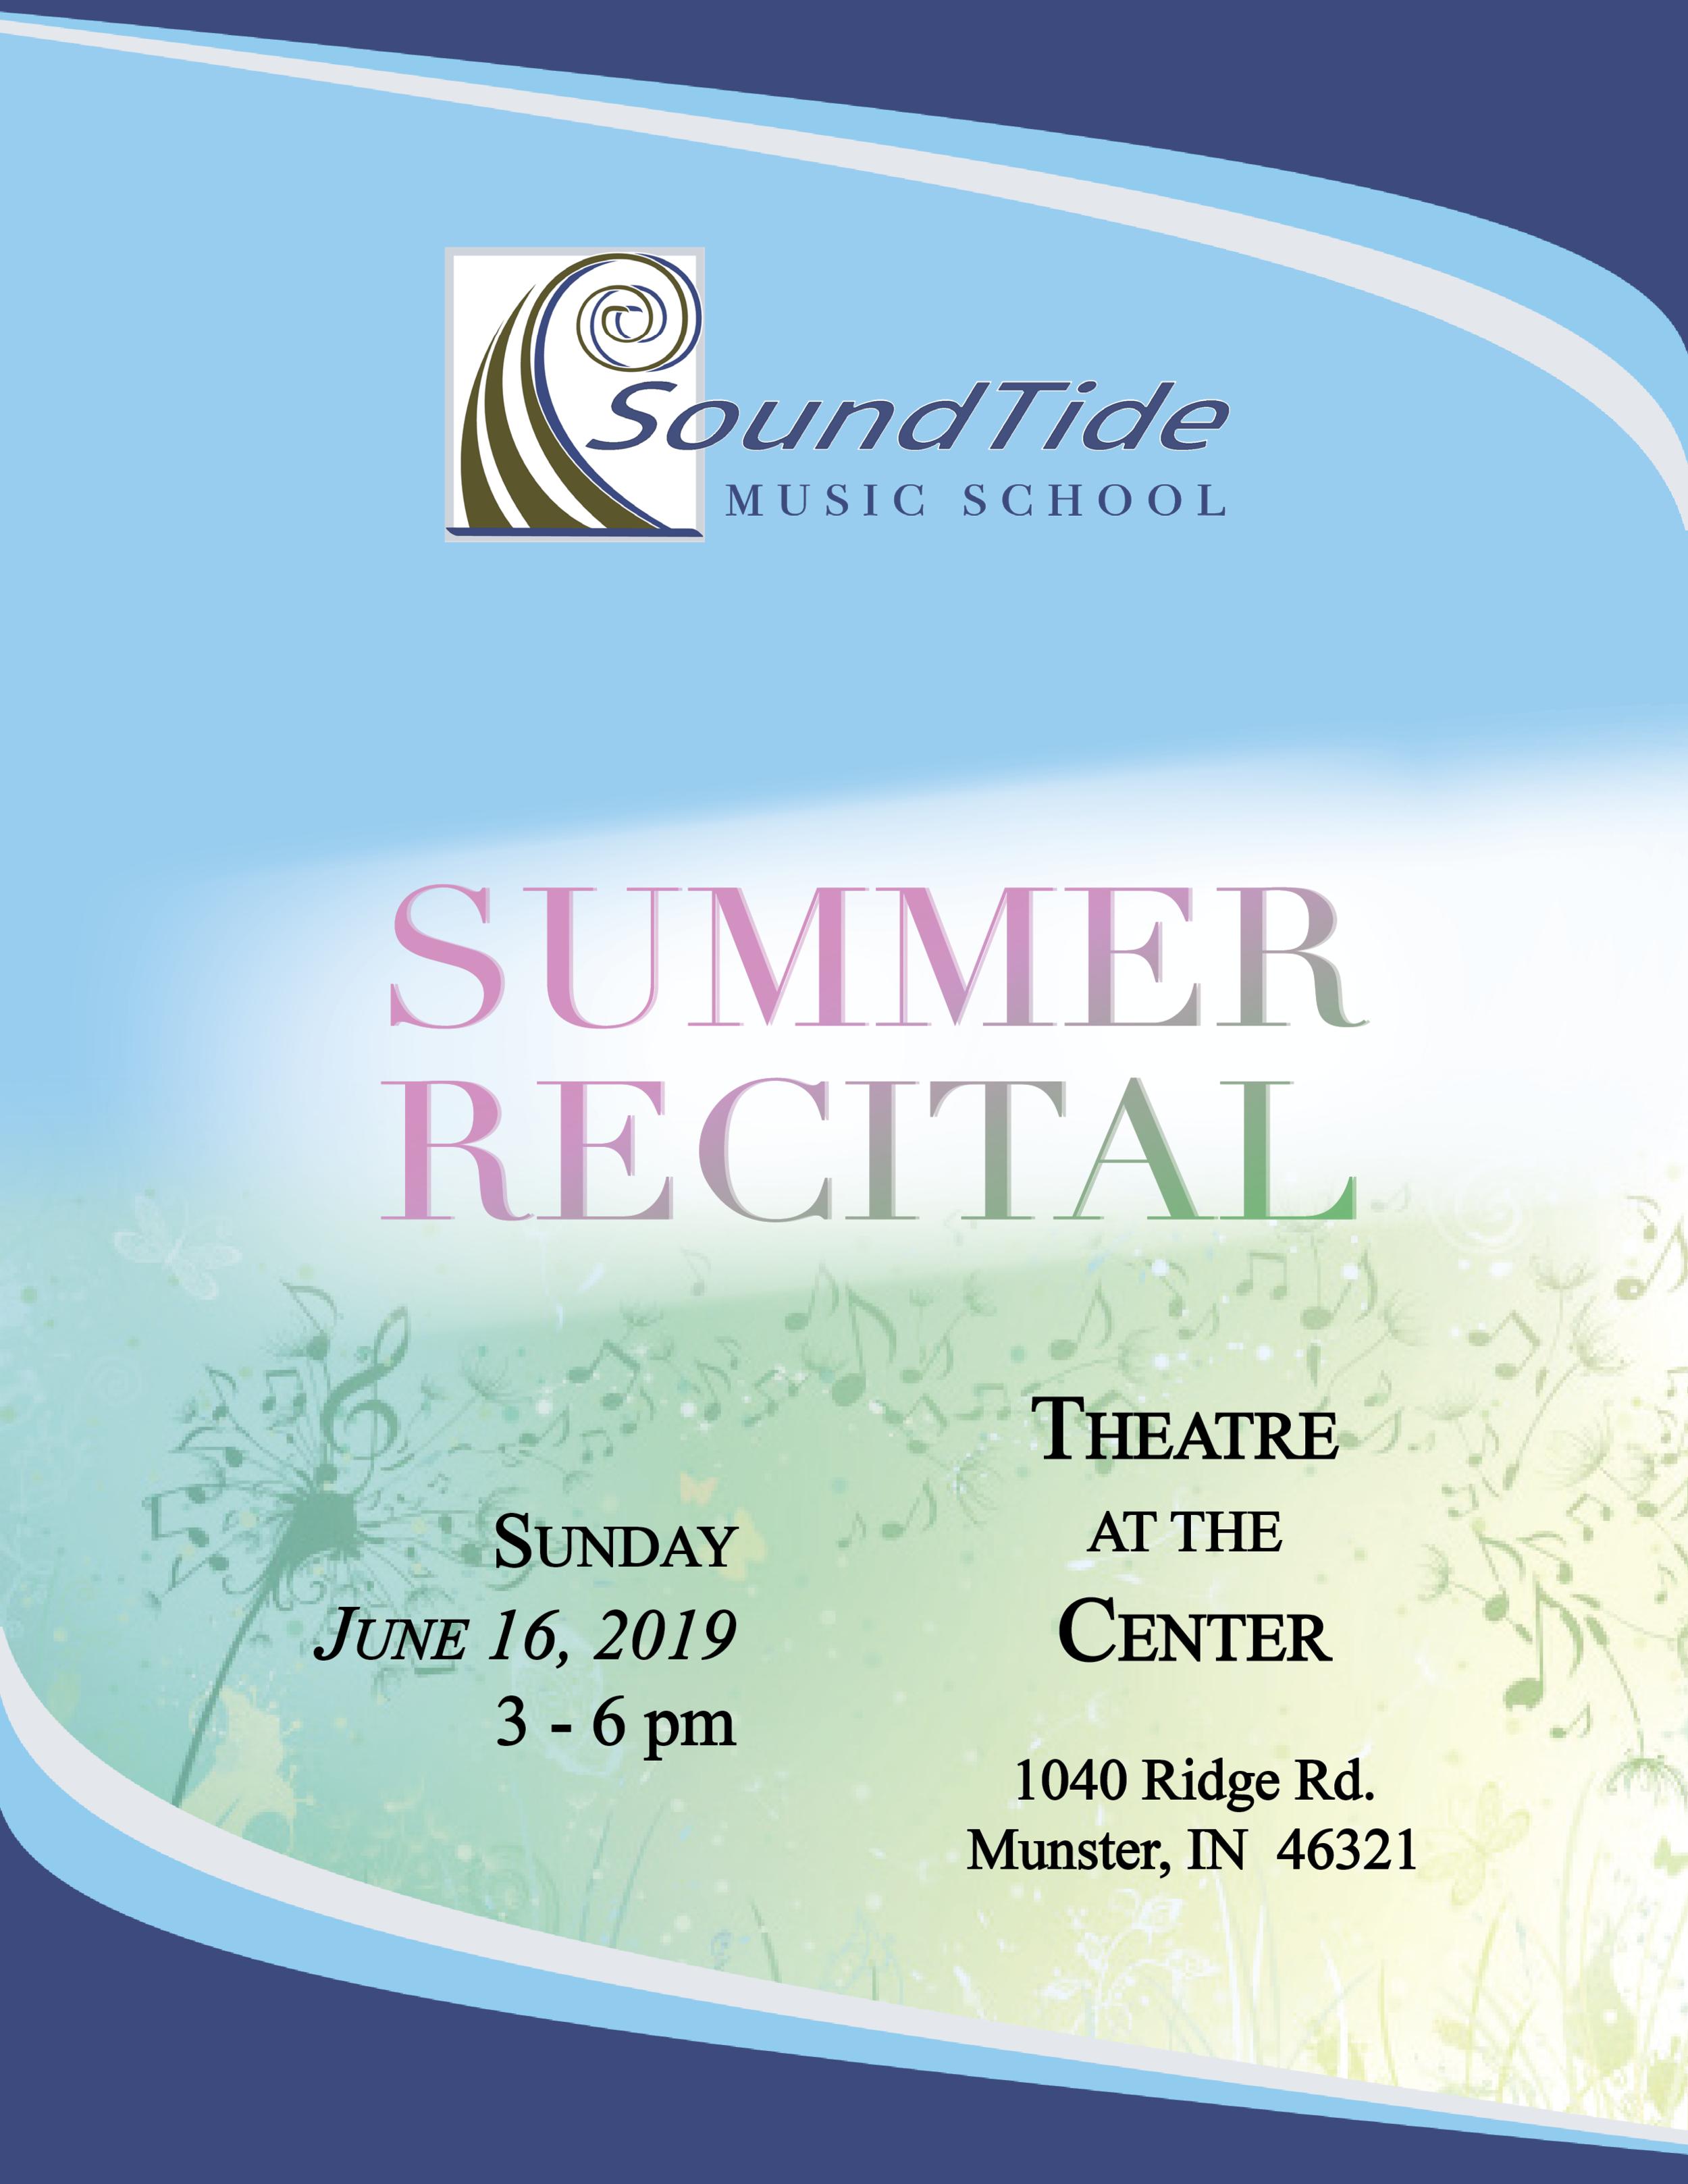 soundtide_summer recital_Template 2019.png